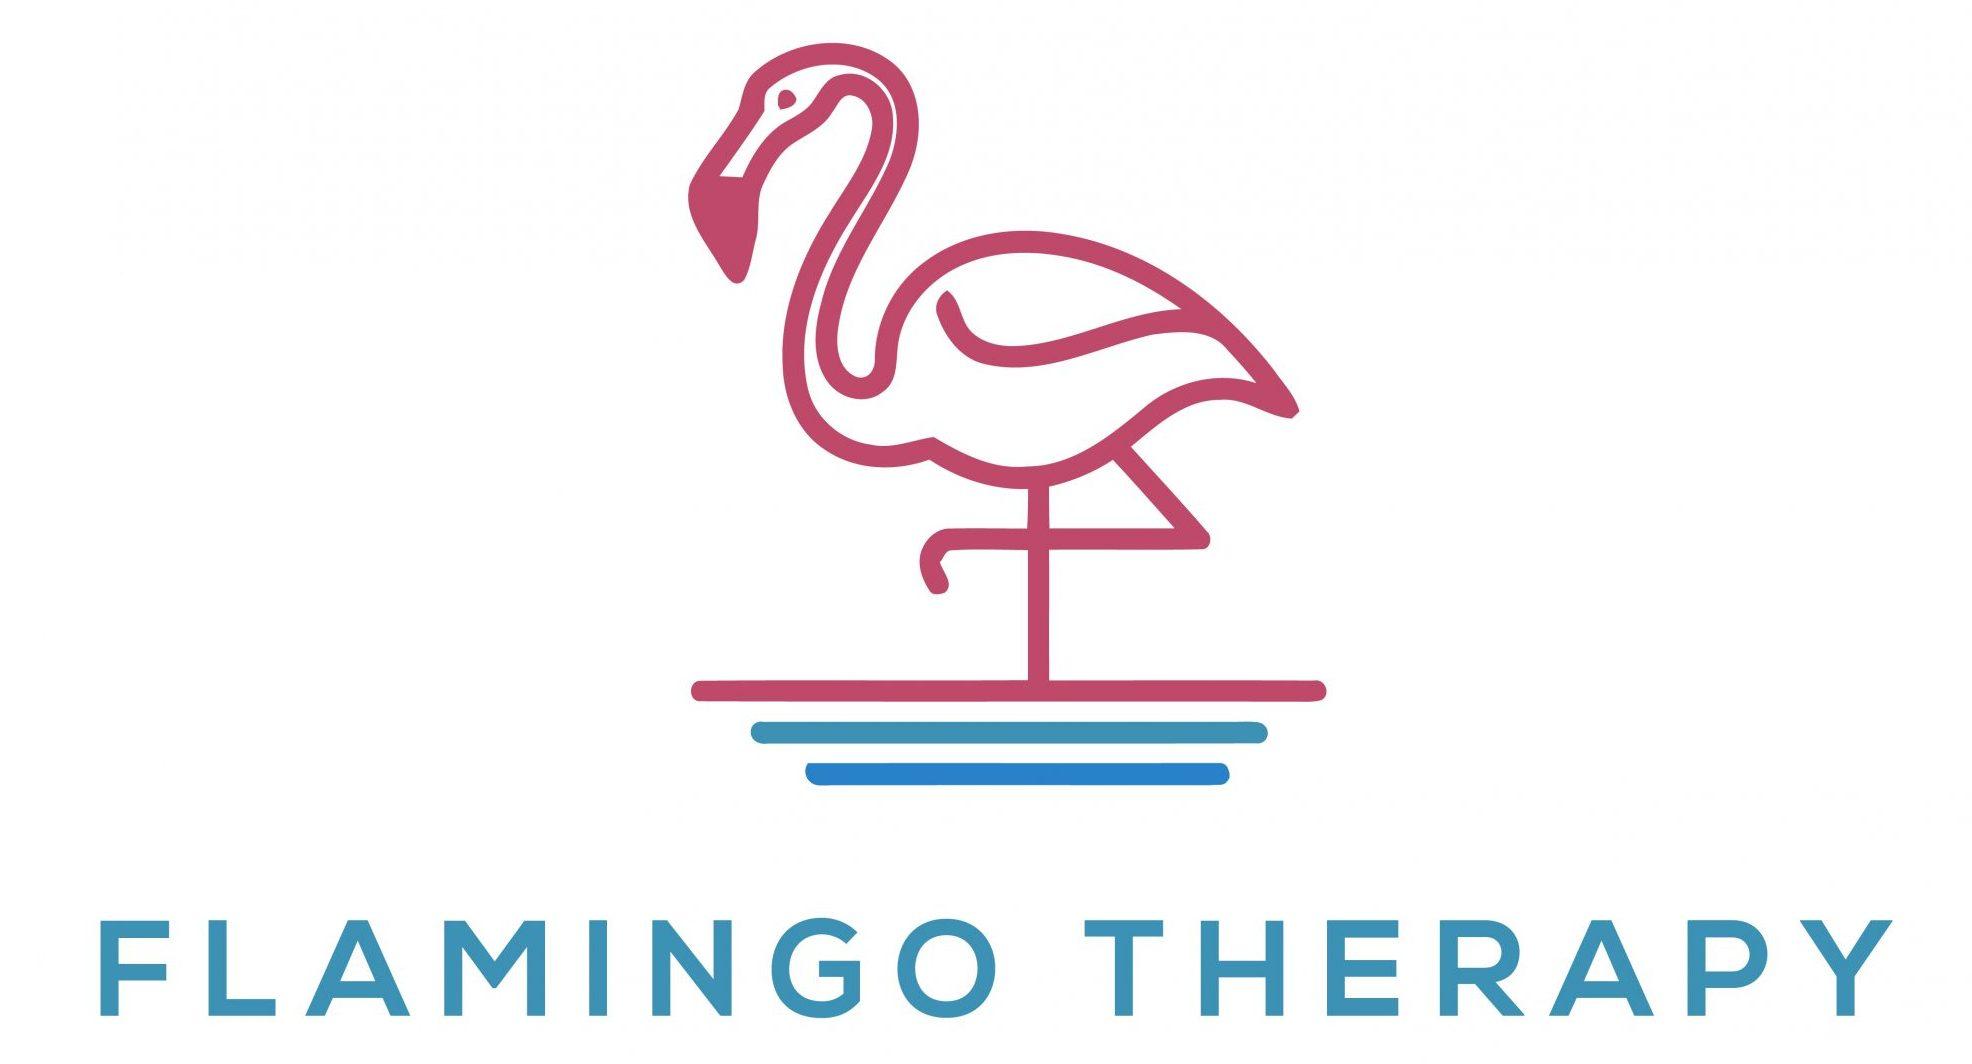 Flamingo Therapy